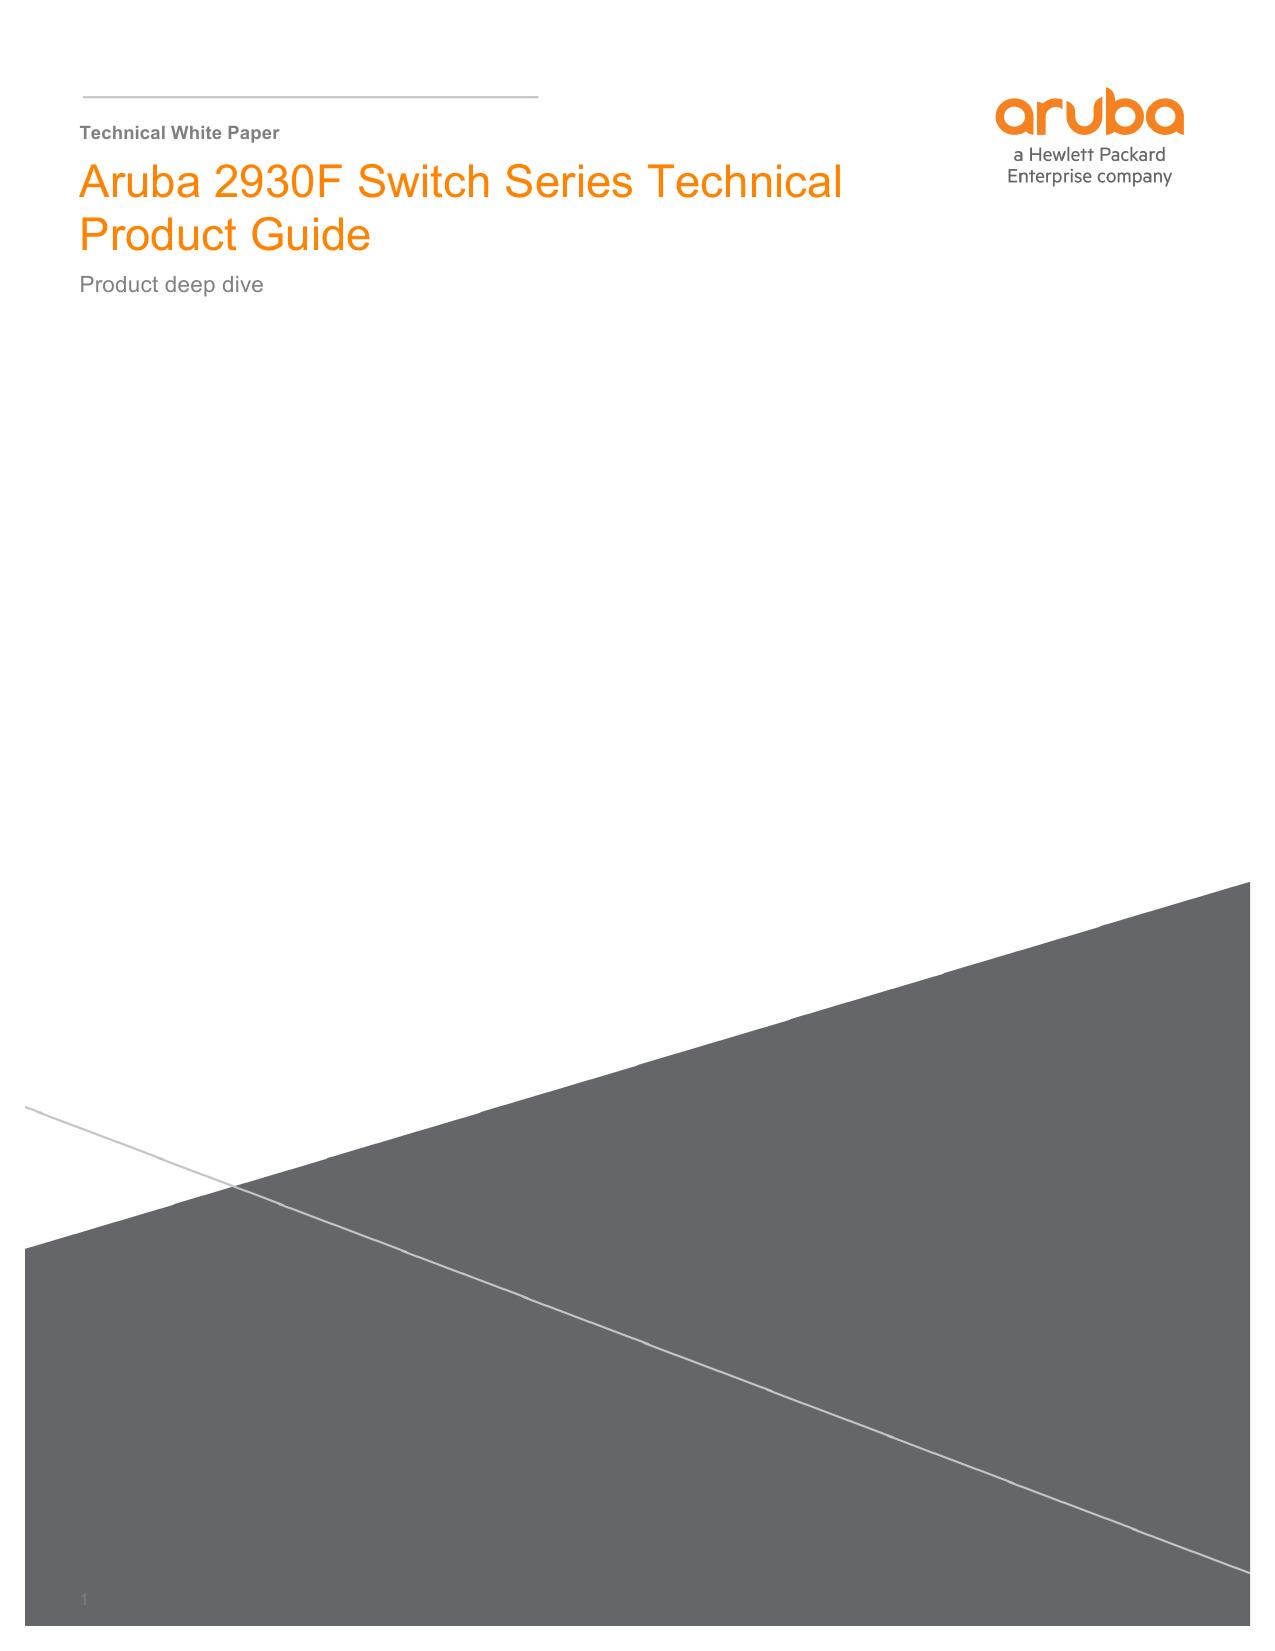 Aruba 2930F Switch Series Technical Product Guide | manualzz com